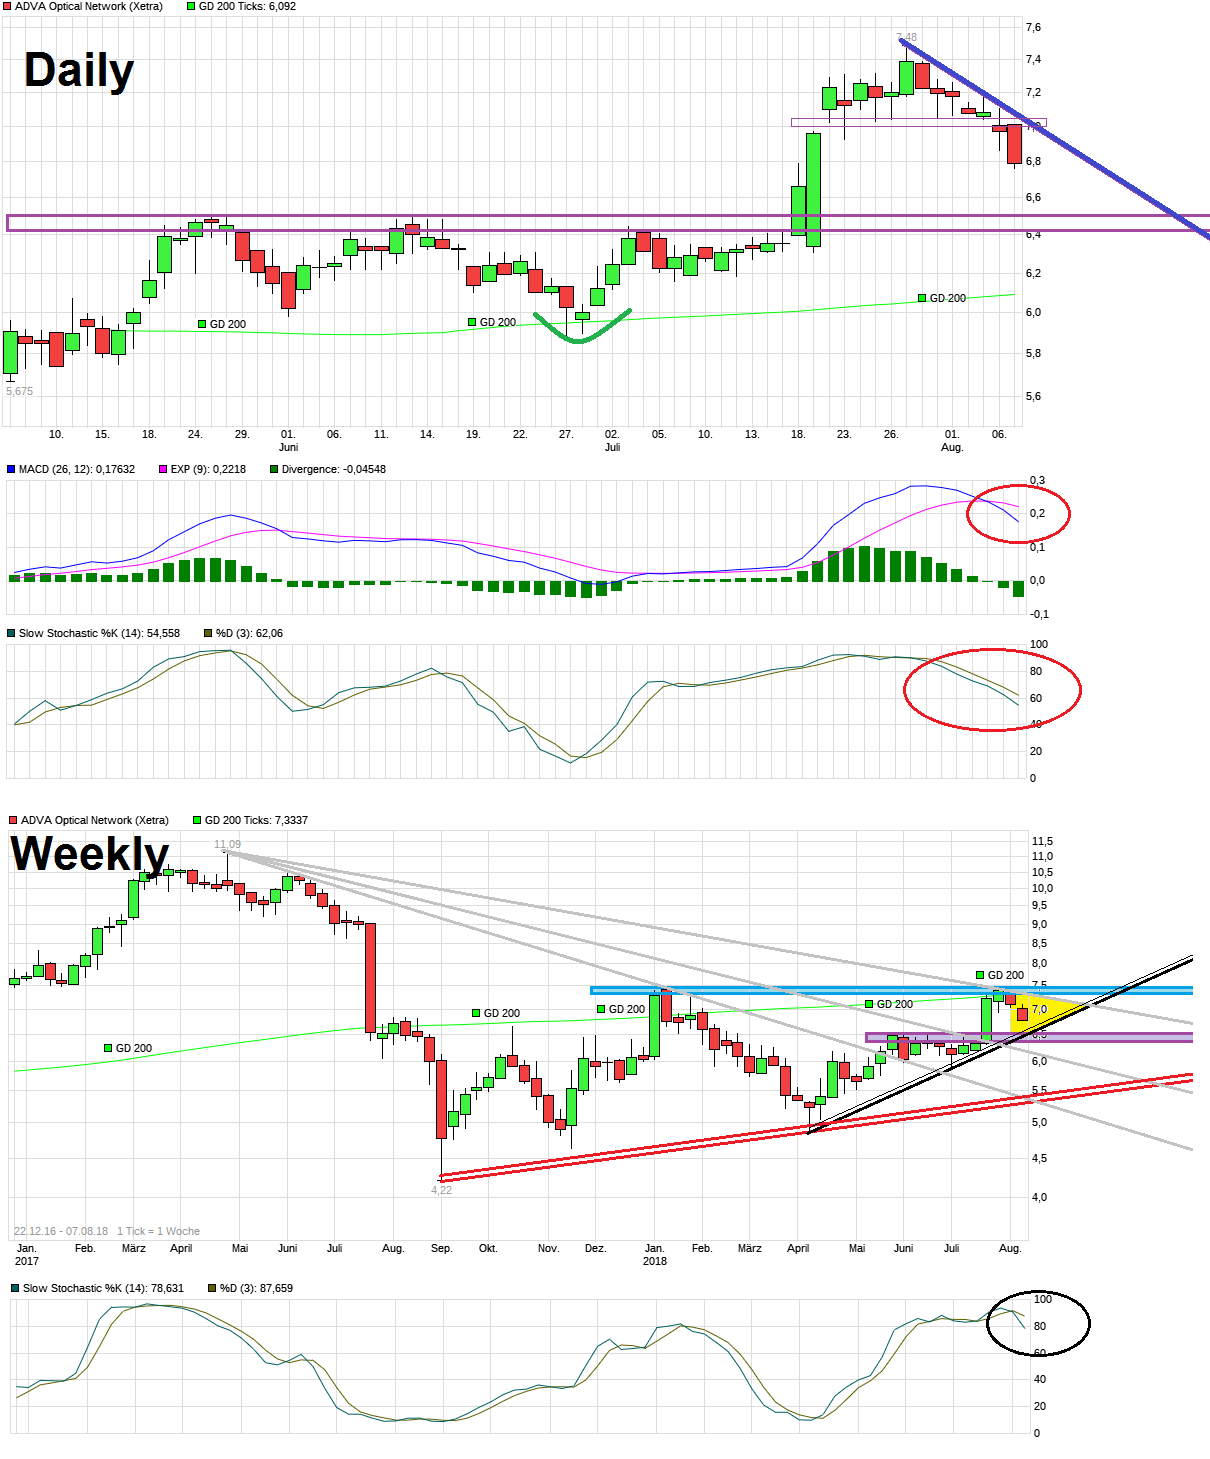 chart_quarter_advaopticalnetwork.png